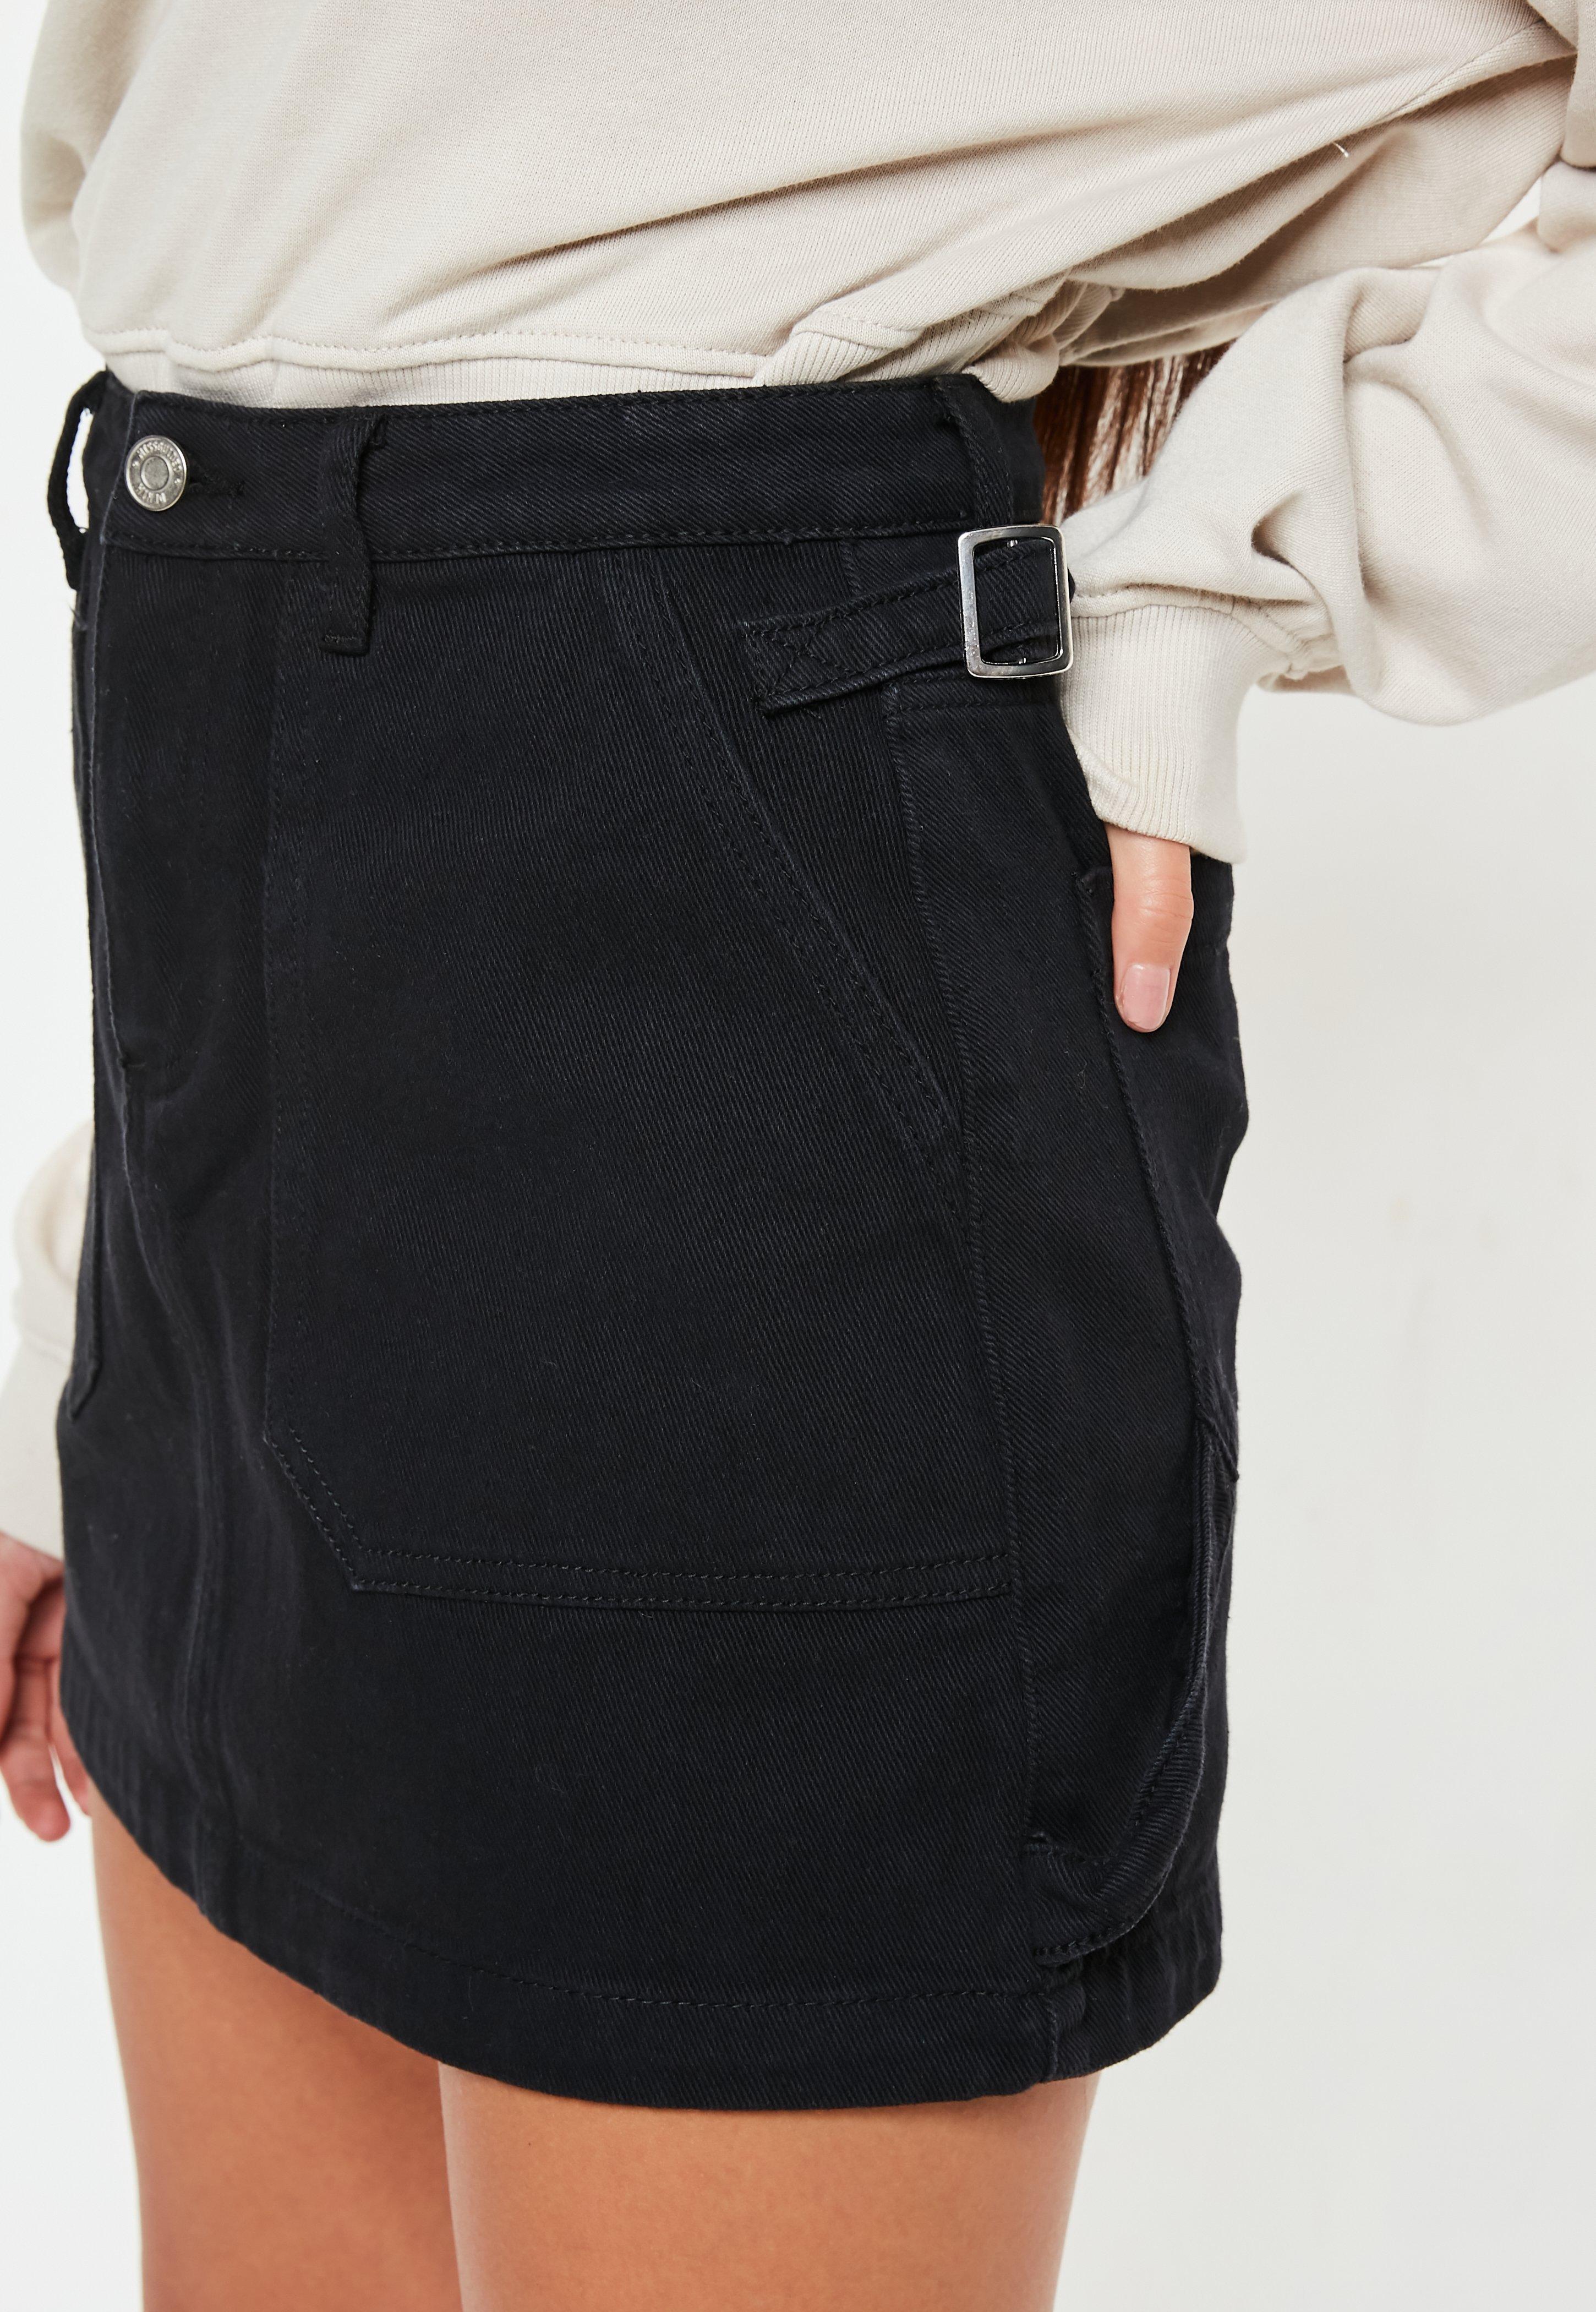 425d46c53 Erika Lilac Metallic Faux Leather Mini Skirt – DACC